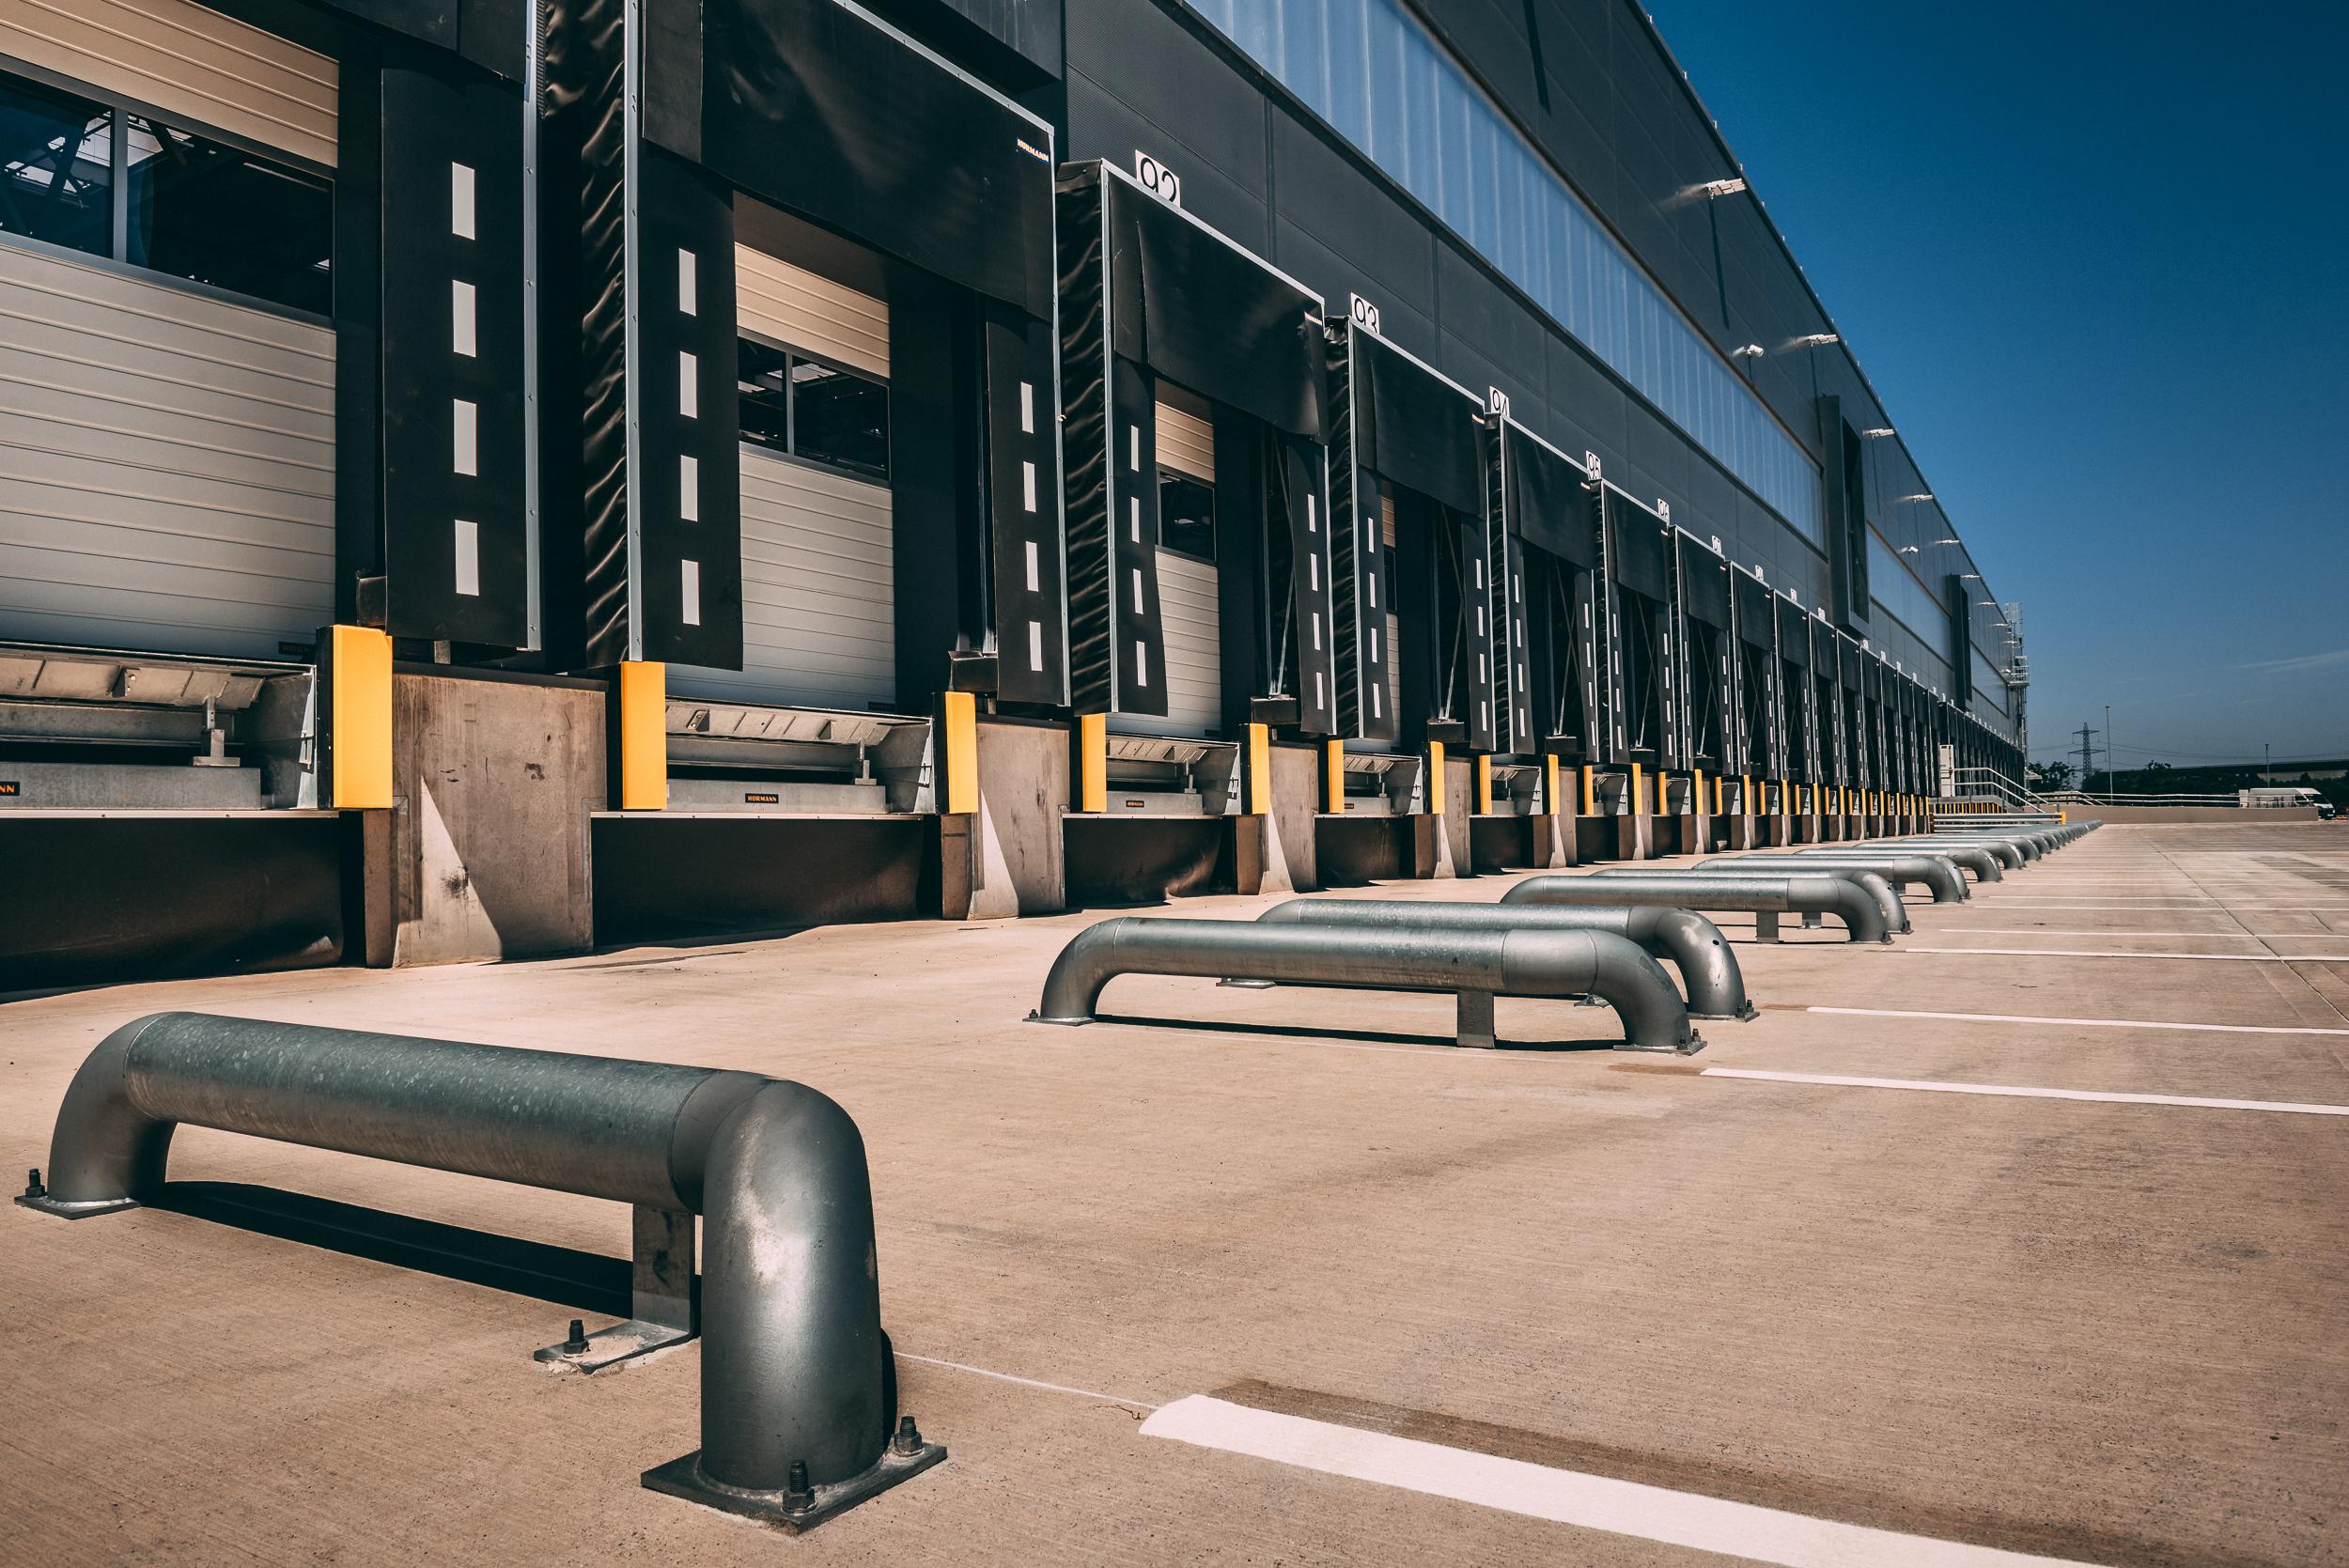 industrial-exterior-10.jpg